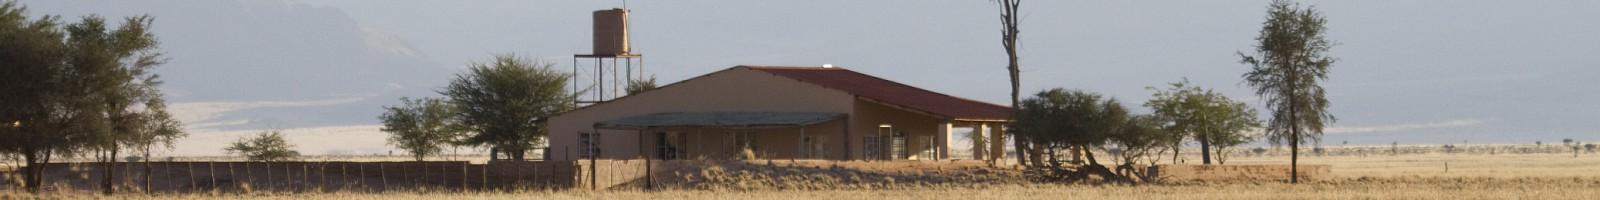 cropped-House-good-smaller.jpg